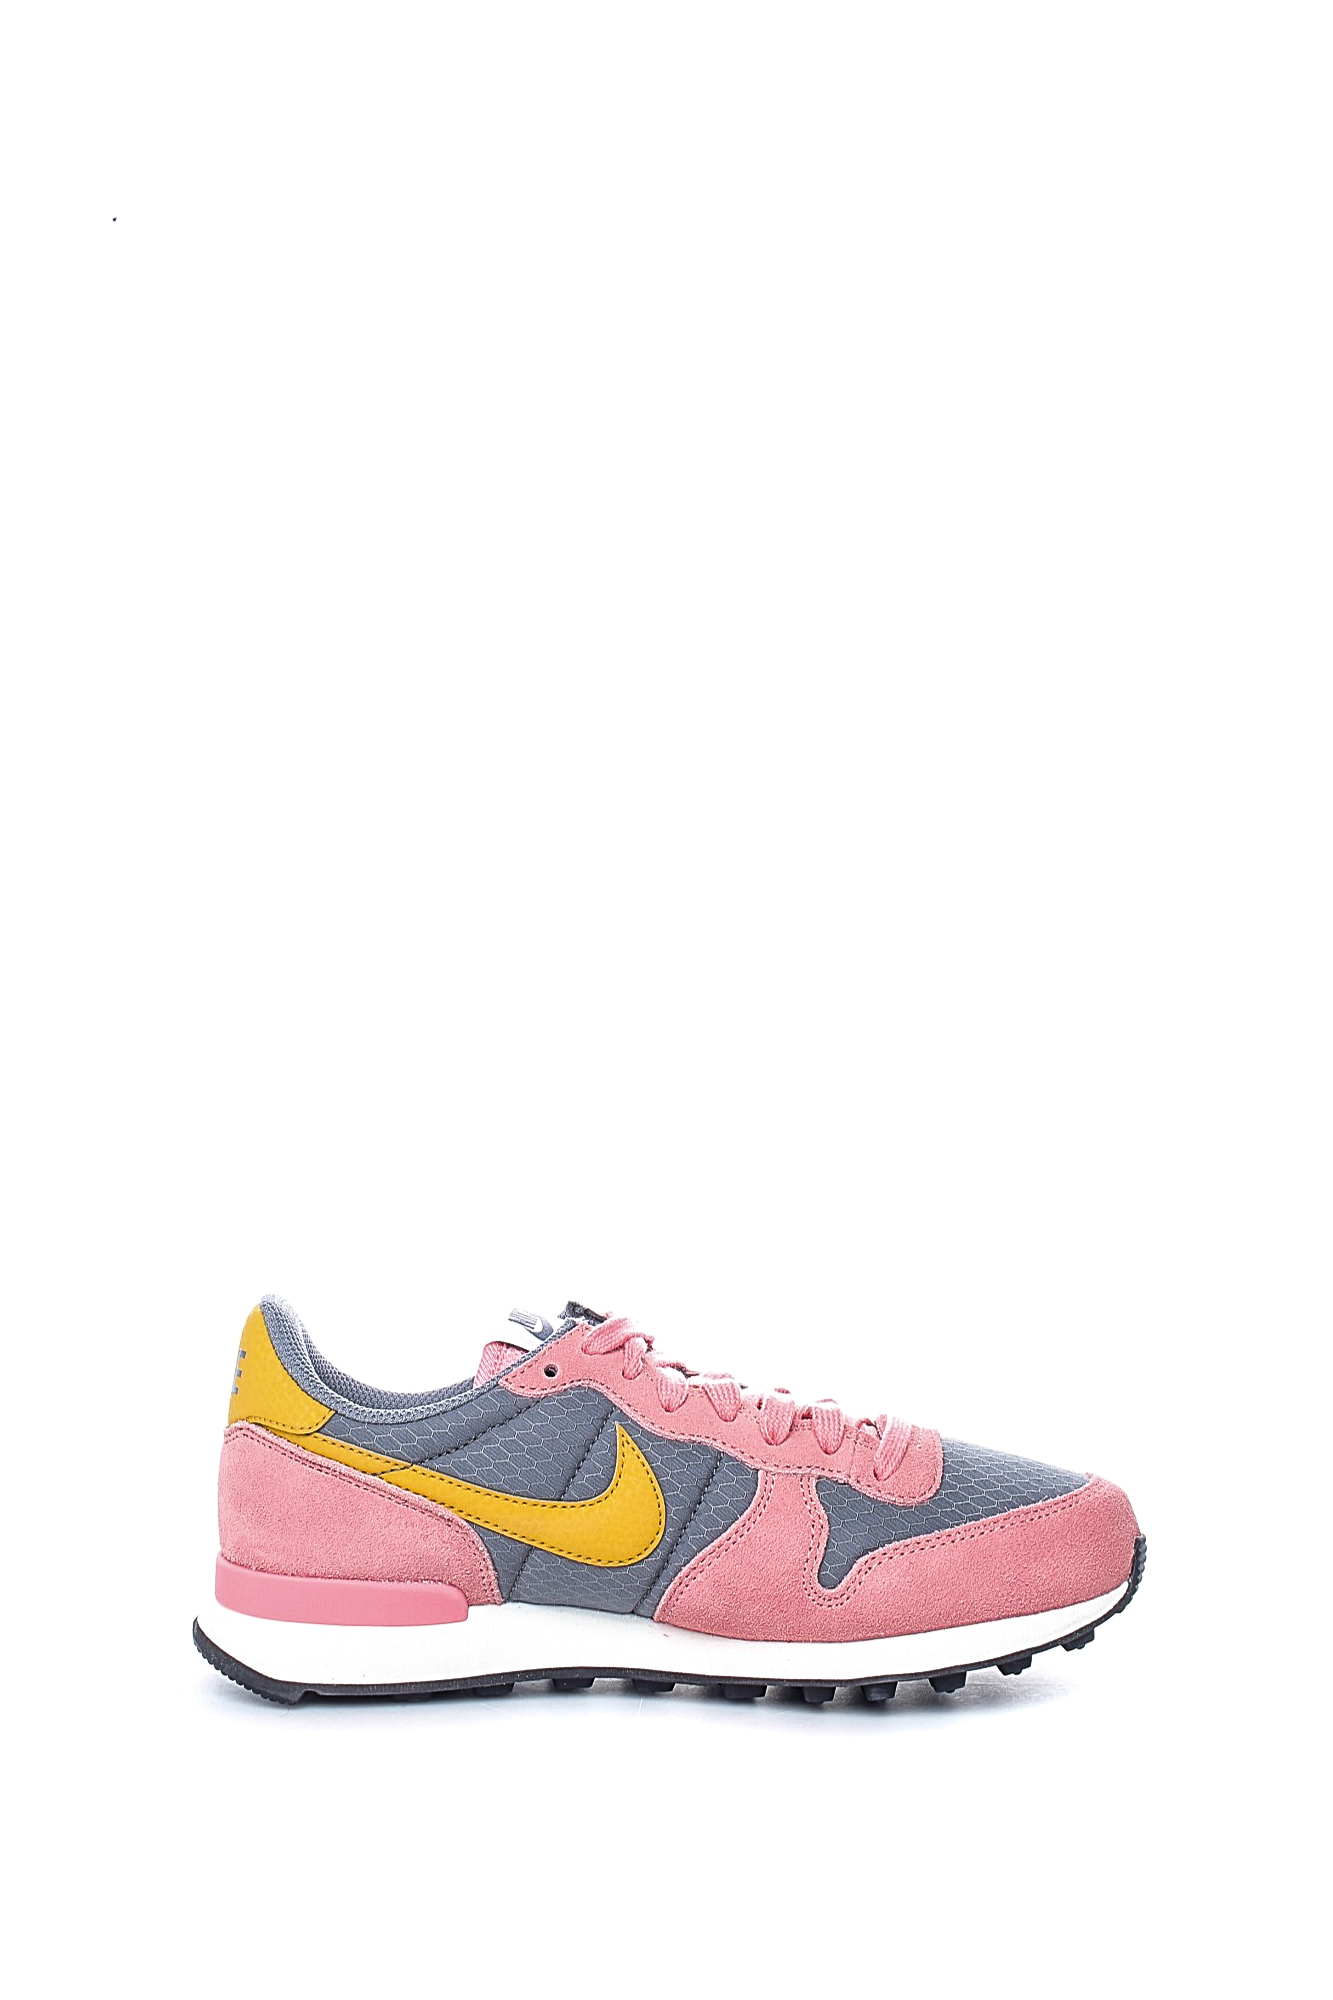 NIKE – Γυναικεία παπούτσια Nike INTERNATIONALIST ροζ – γκρι